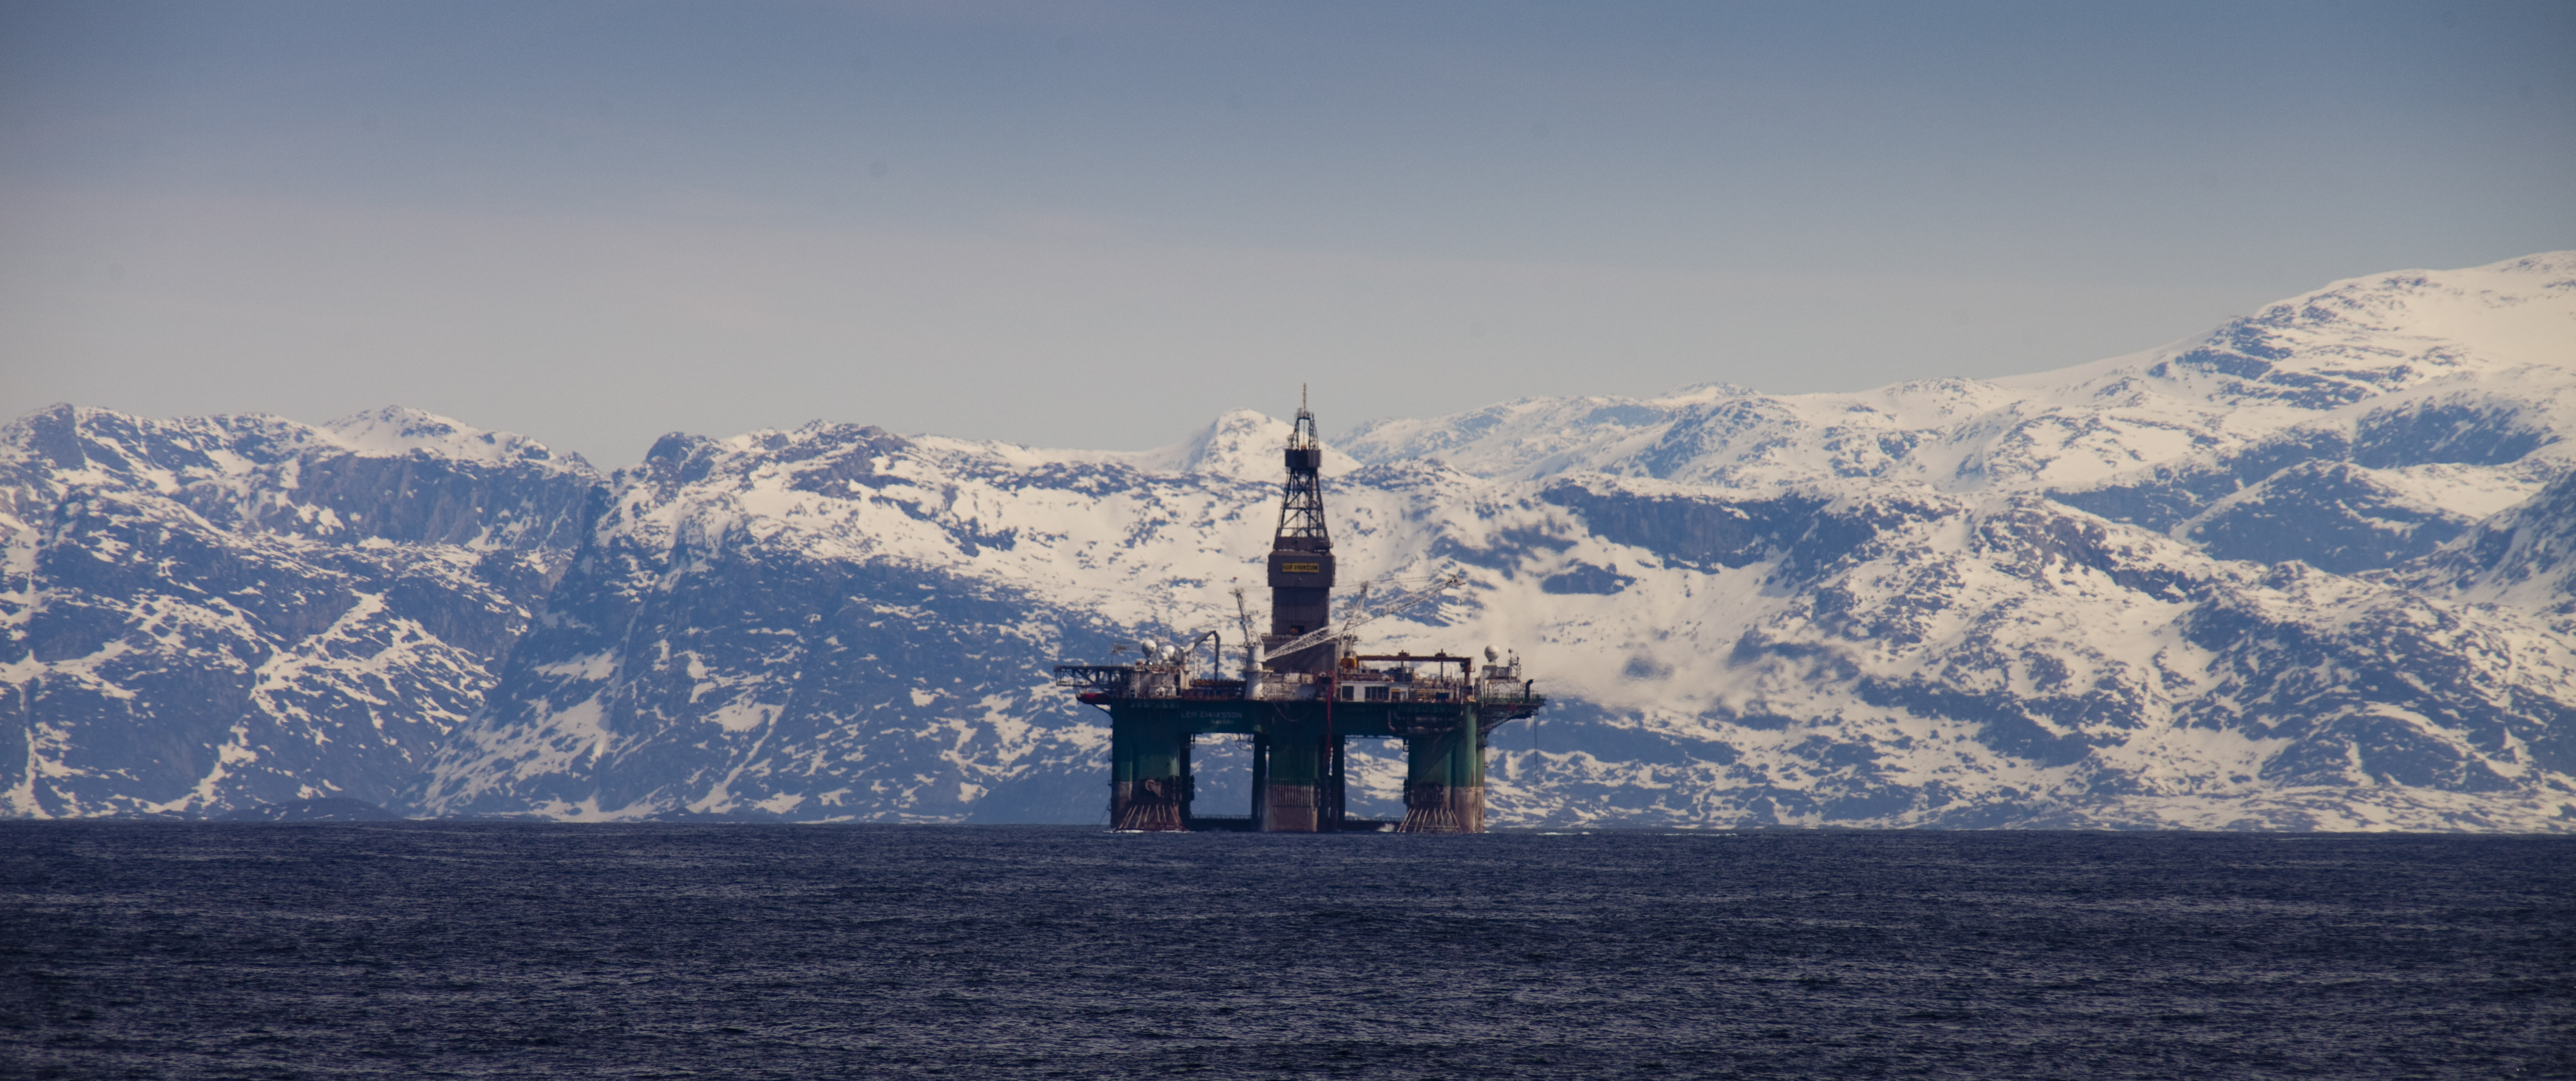 ArcticDrillingAbandonded.jpg